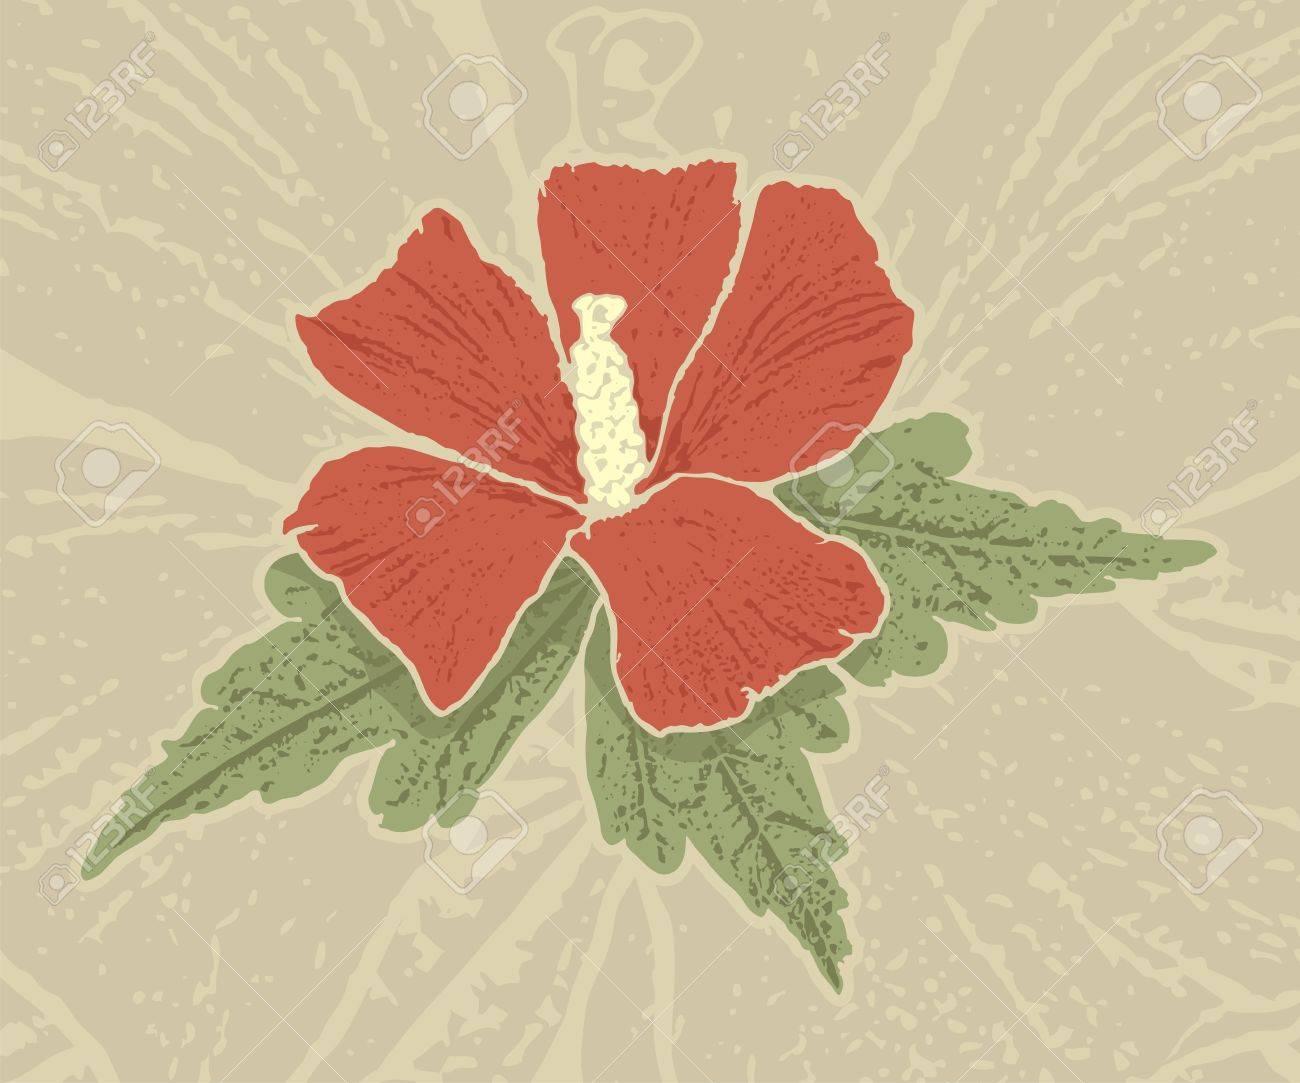 Red hibiscus flower with grunge shading on grunge beige background. - 10255307